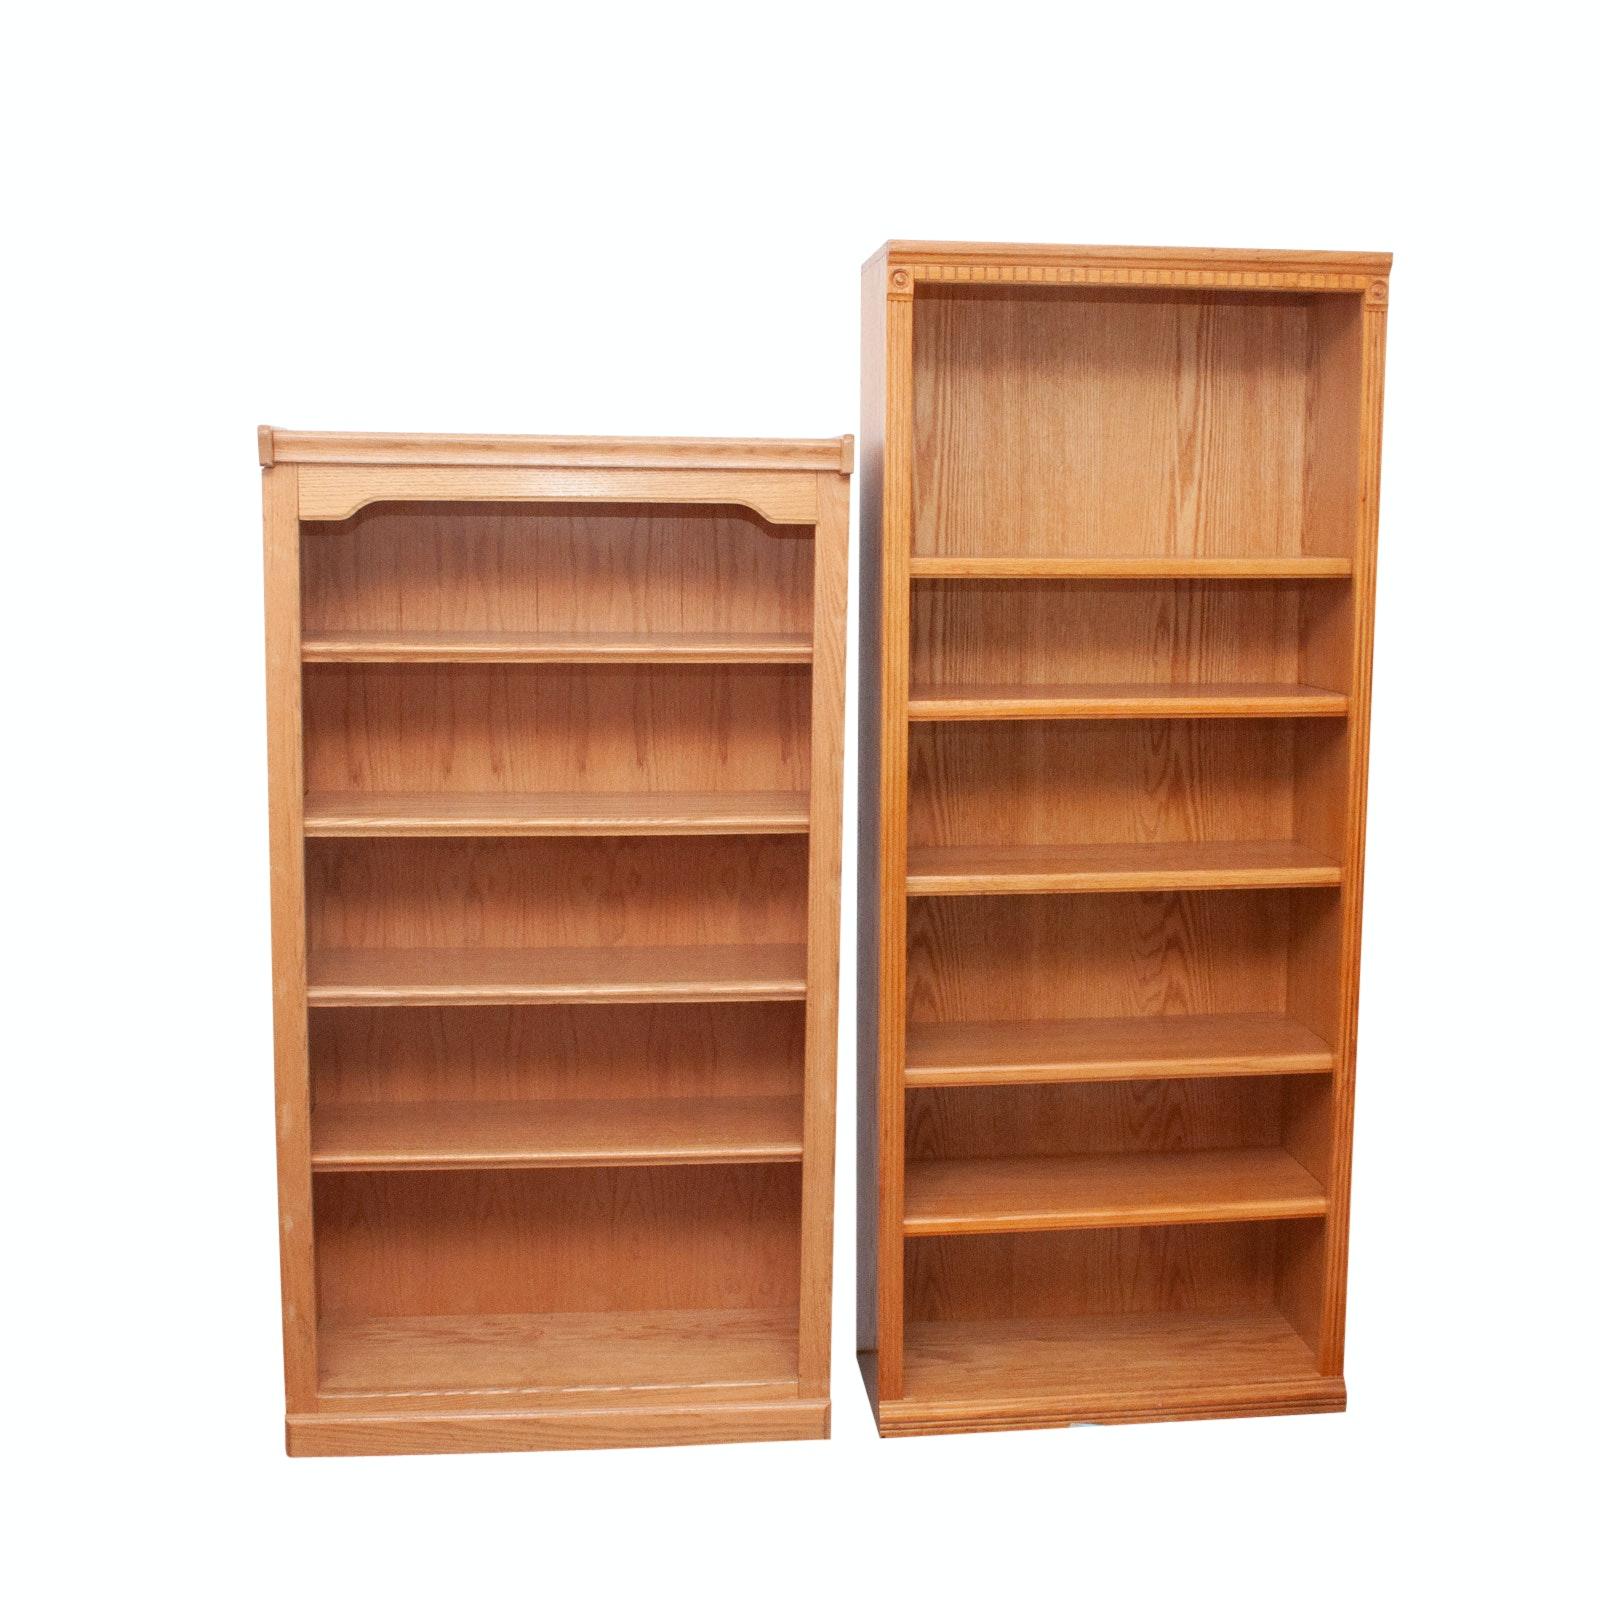 Wood Oak Style Bookcases